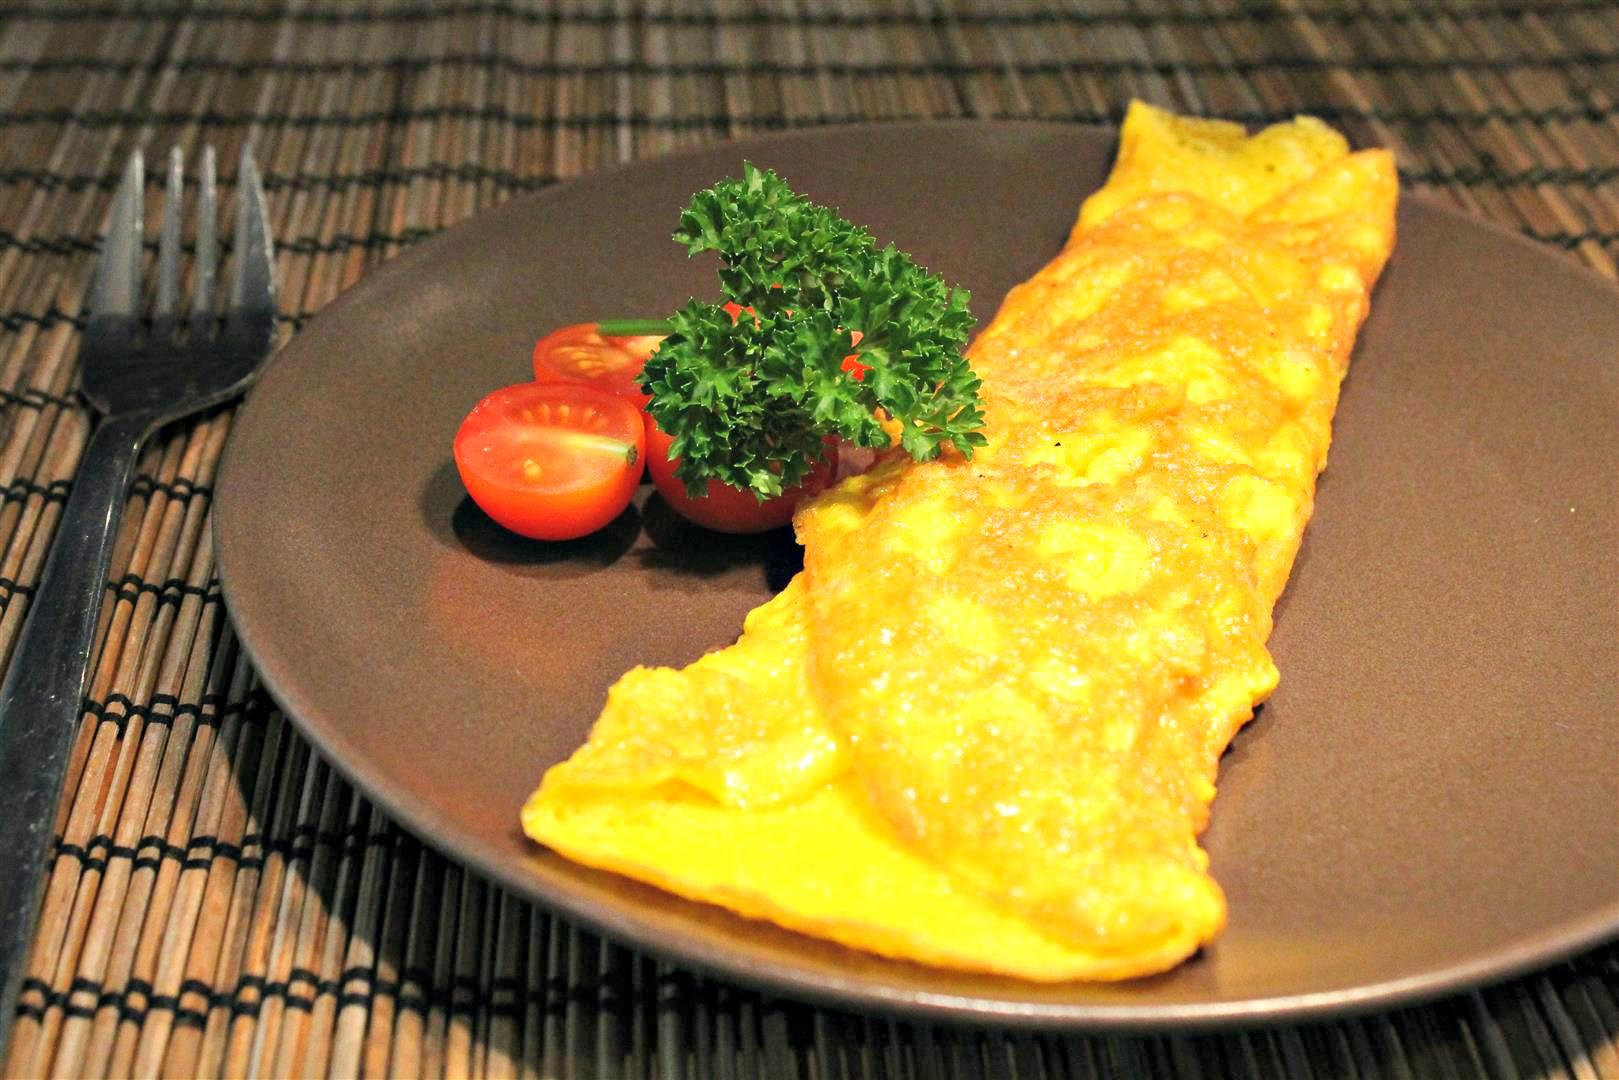 omlett magas vérnyomás esetén enap magas vérnyomás esetén 1 fok